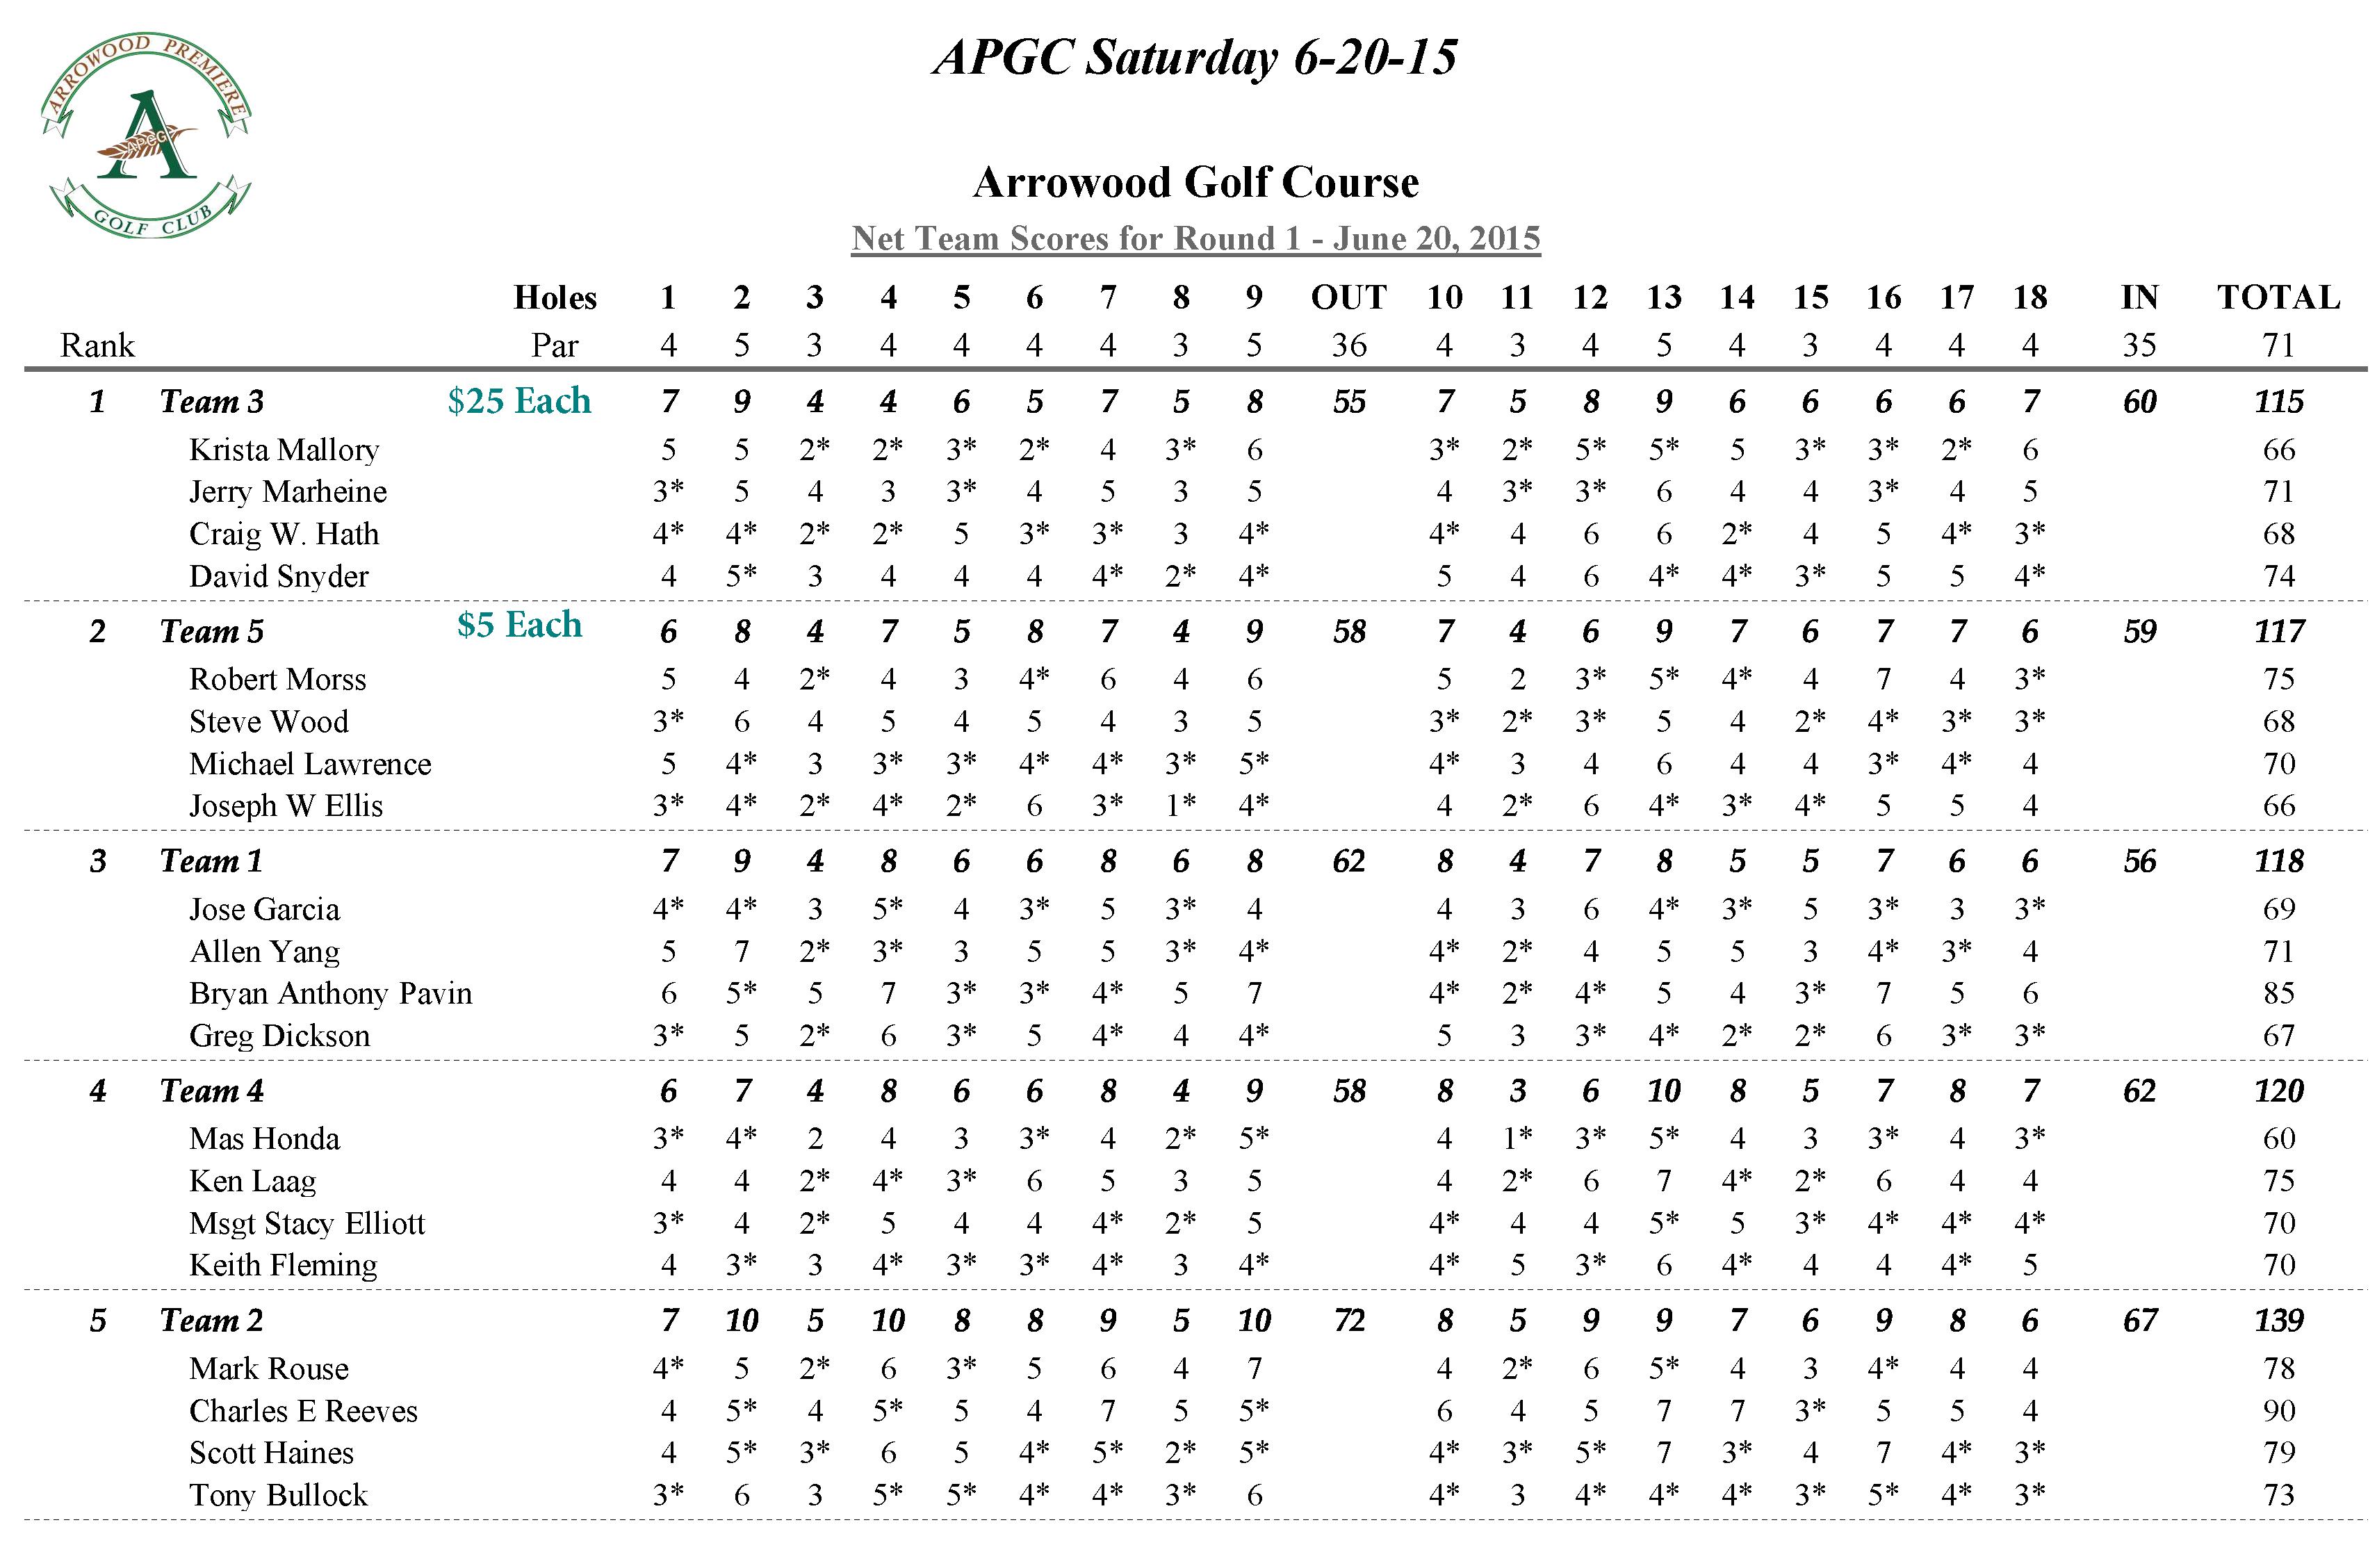 APGC Saturday 6-20-15